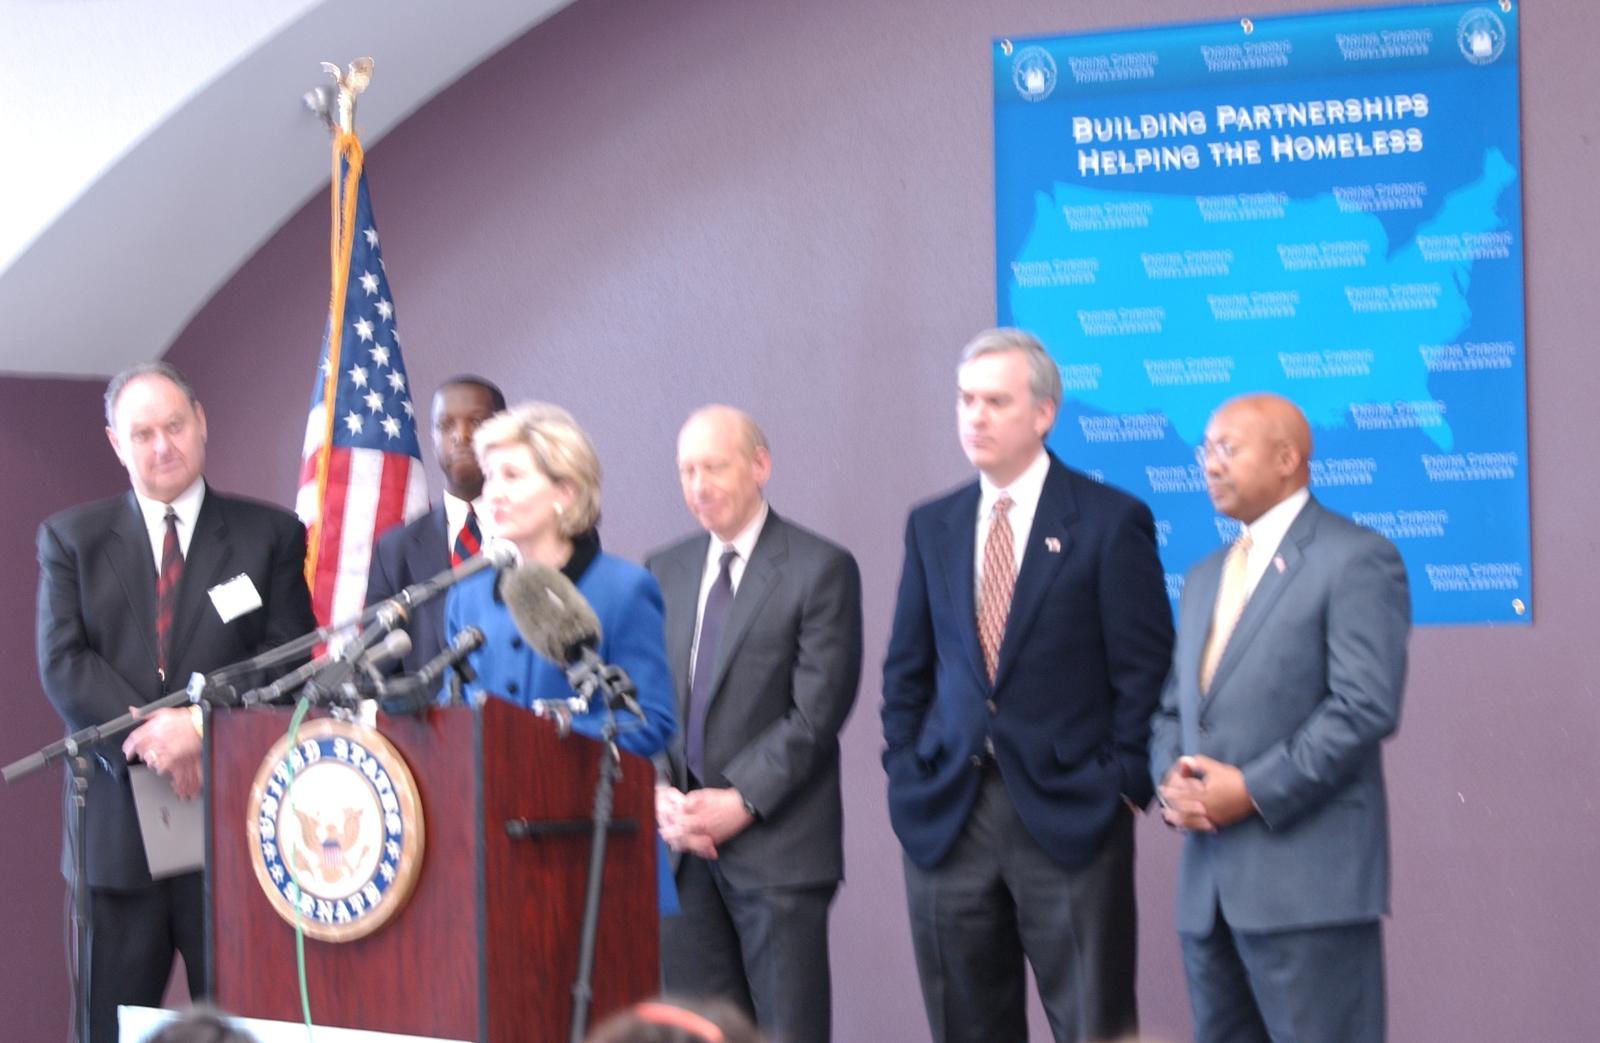 Secretary Alphonso Jackson with Senator Kay Bailey Hutchison at Homeless Funding Announcement